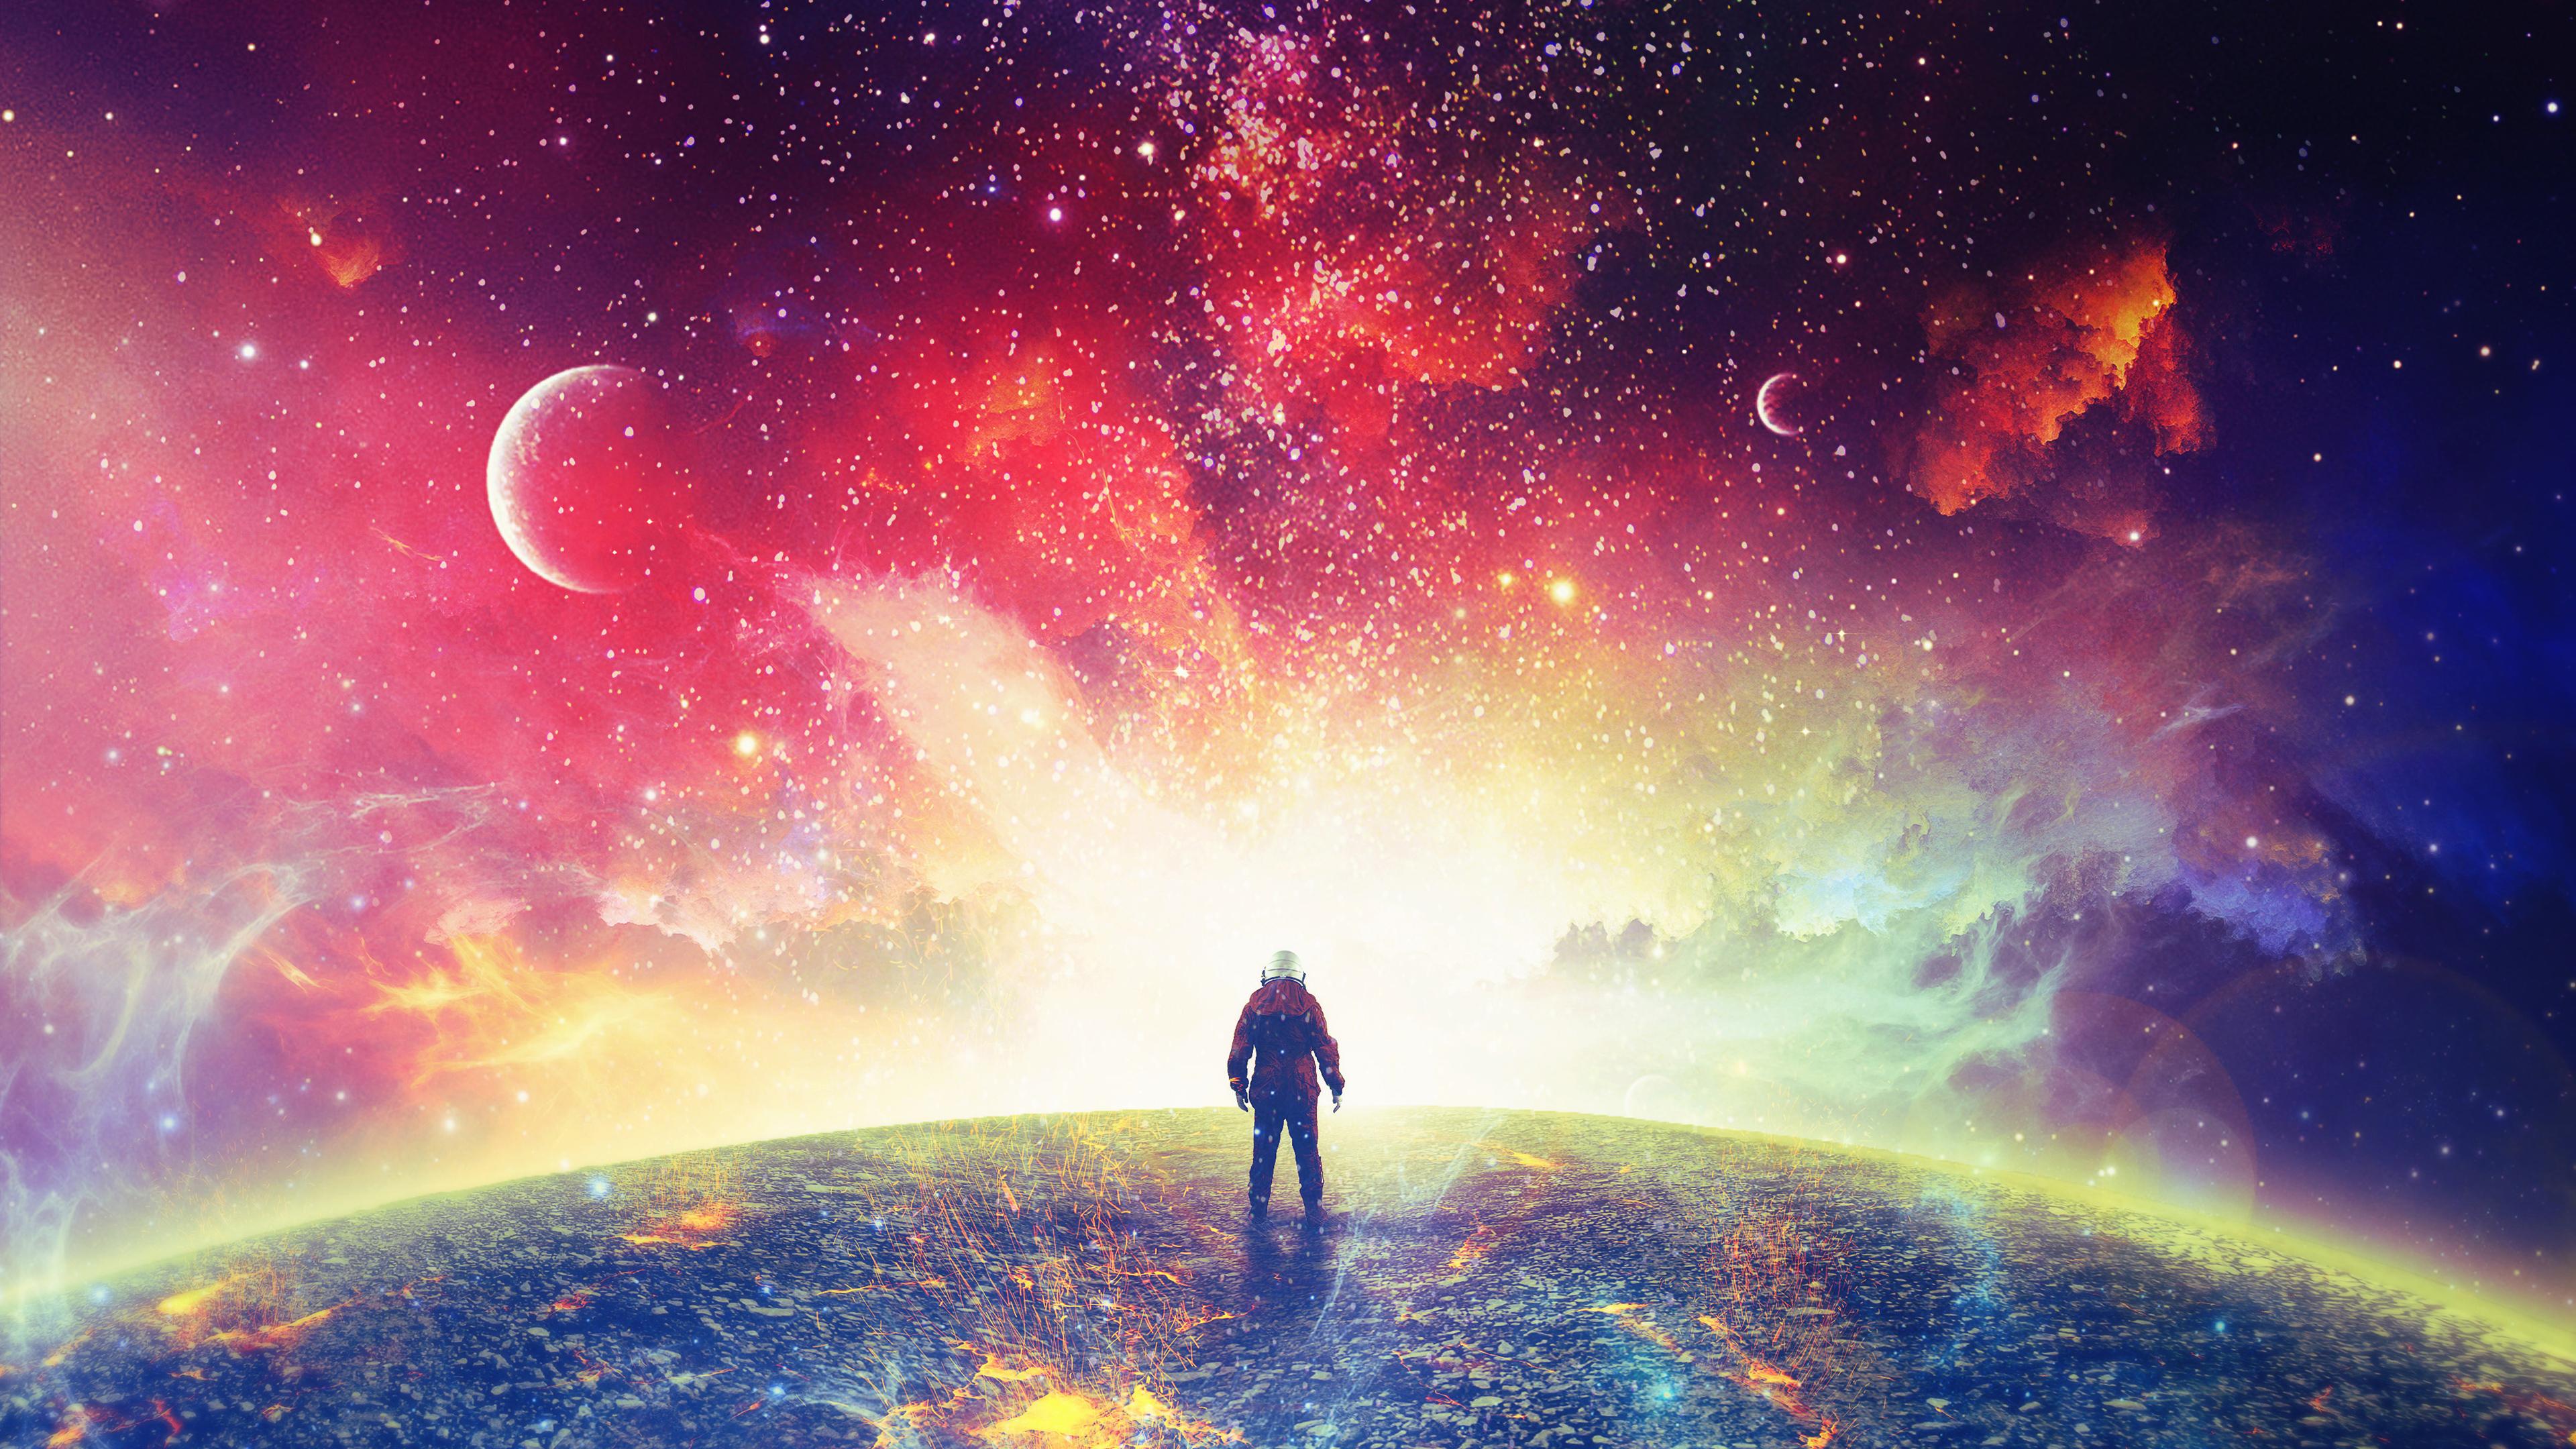 4k Astronaut Wallpaper Posted By Ryan Mercado